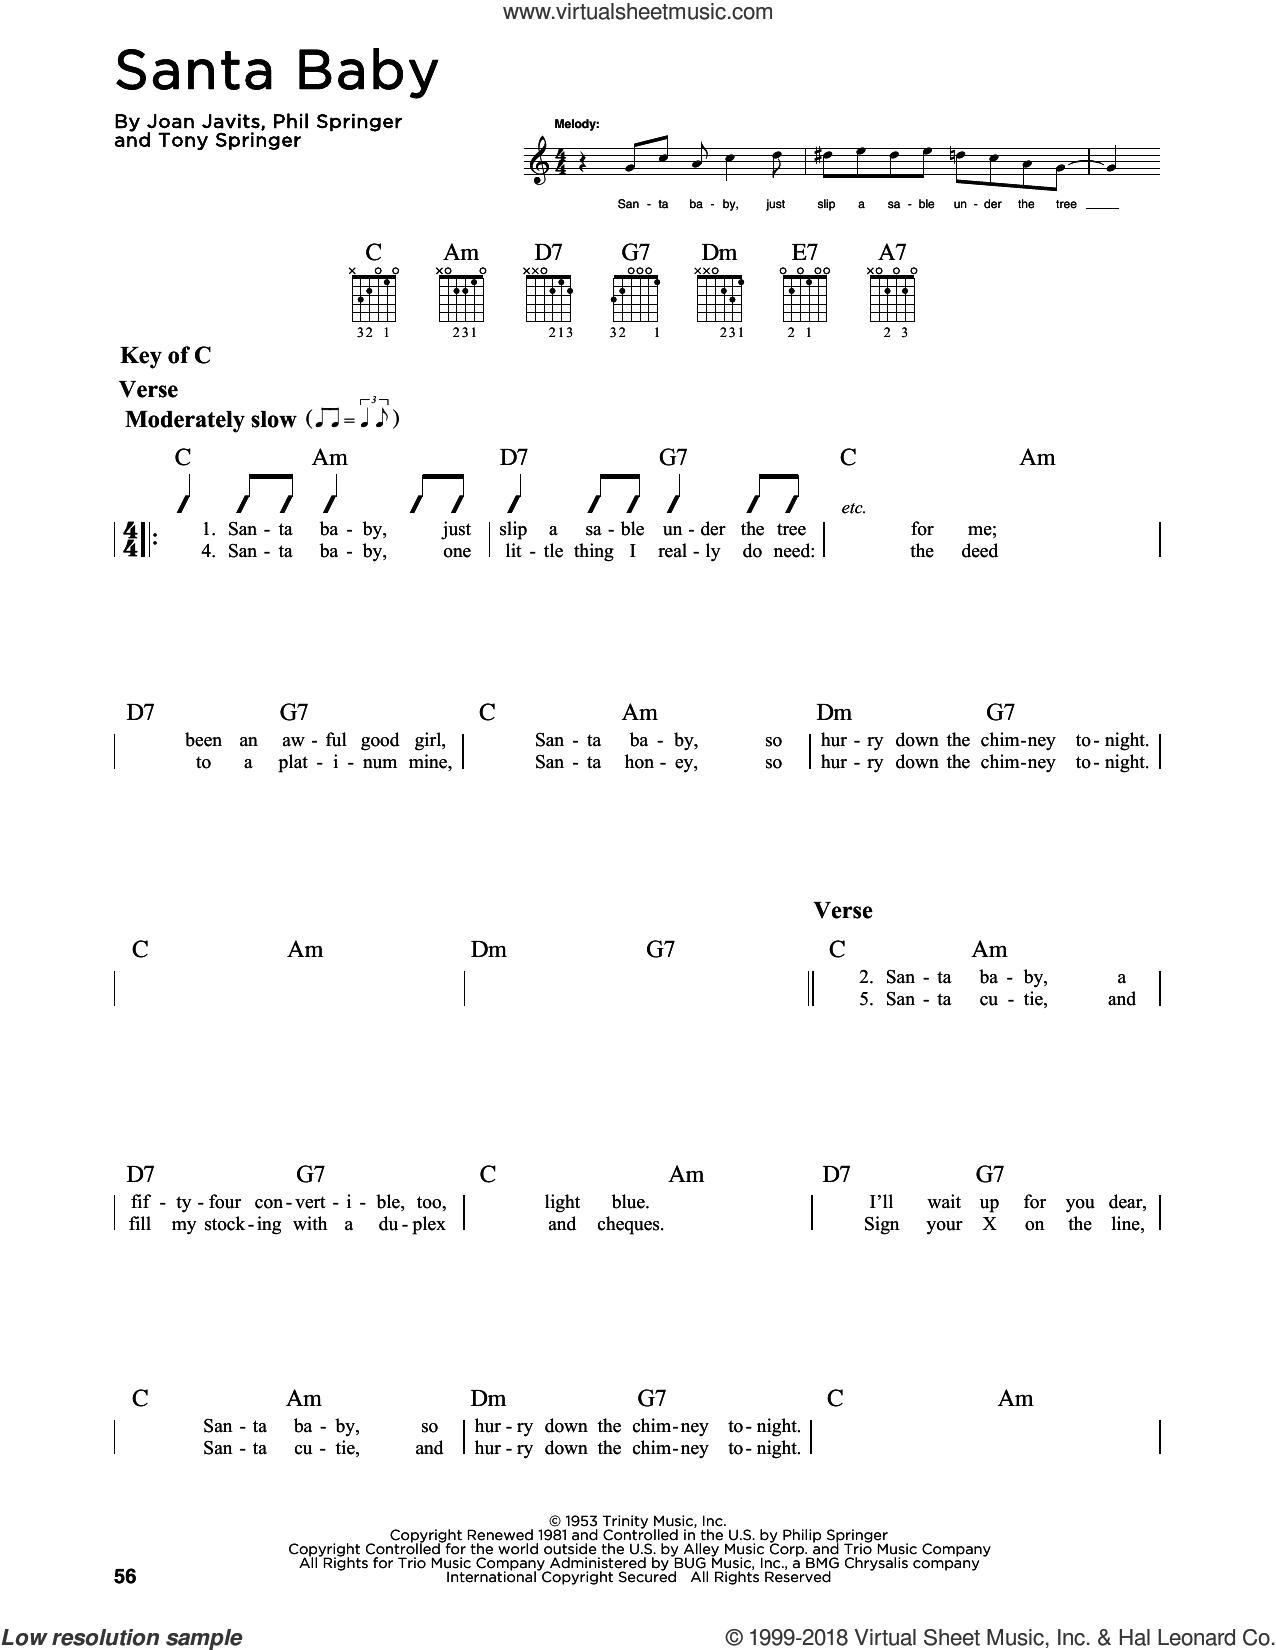 Santa Baby sheet music for guitar solo (lead sheet) by Eartha Kitt, Kellie Pickler, Miscellaneous, Taylor Swift, Joan Javits, Phil Springer and Tony Springer, intermediate guitar (lead sheet)